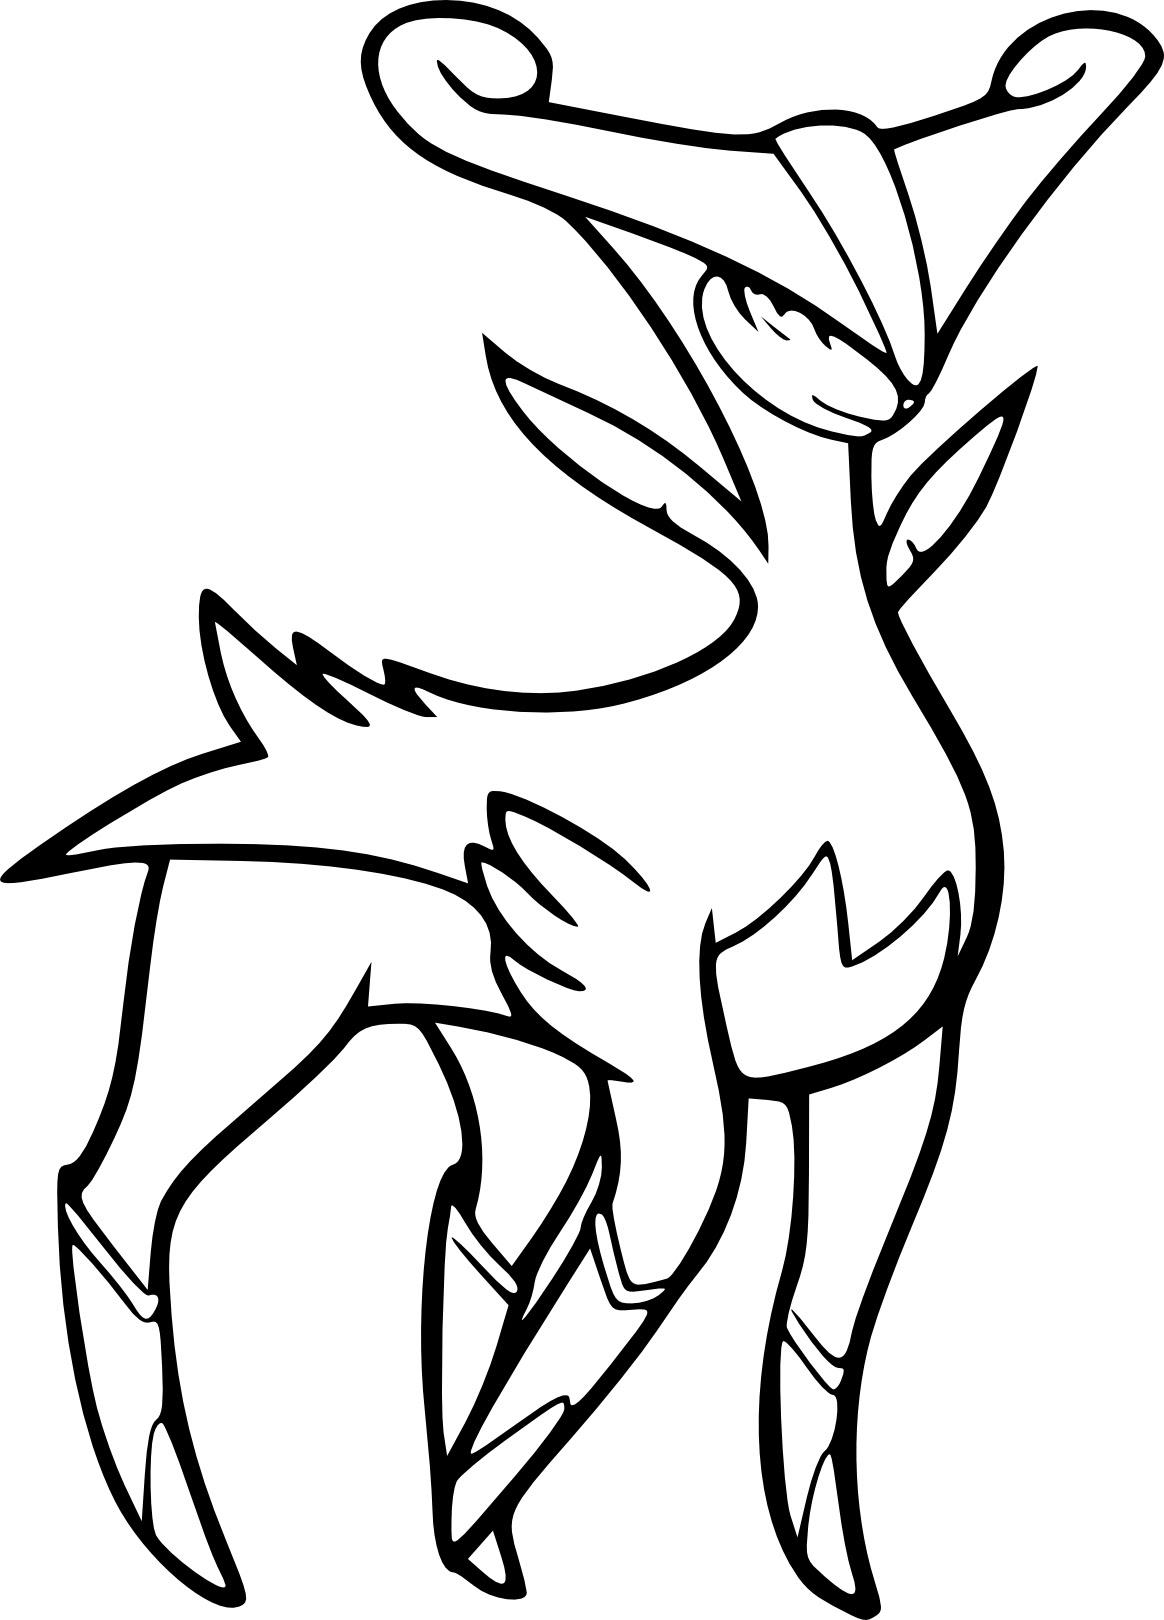 Coloriage pokemon gratuit dessin a imprimer 268